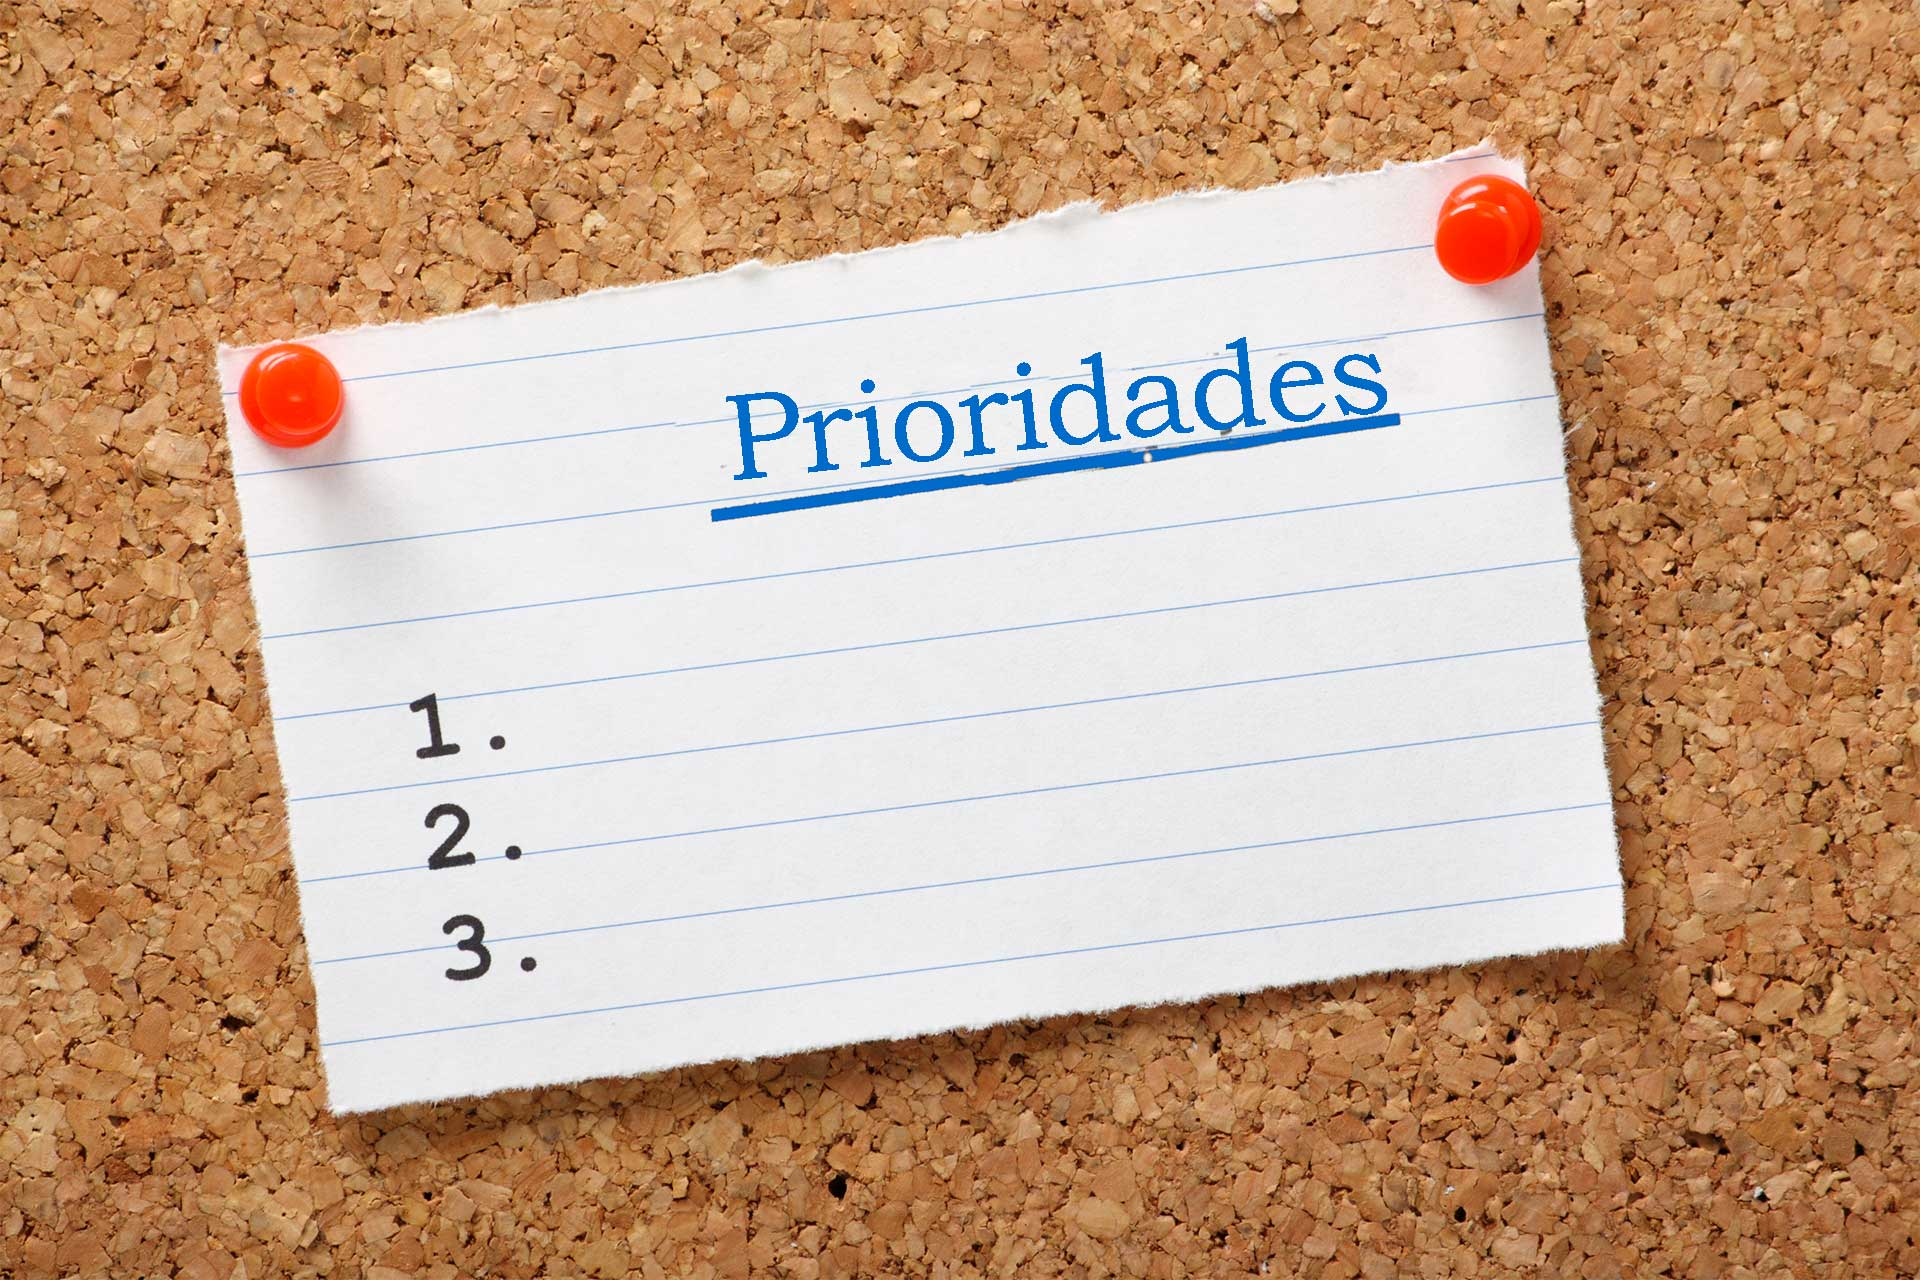 Parashat Mishpatim: Prioridades (5781-2021)